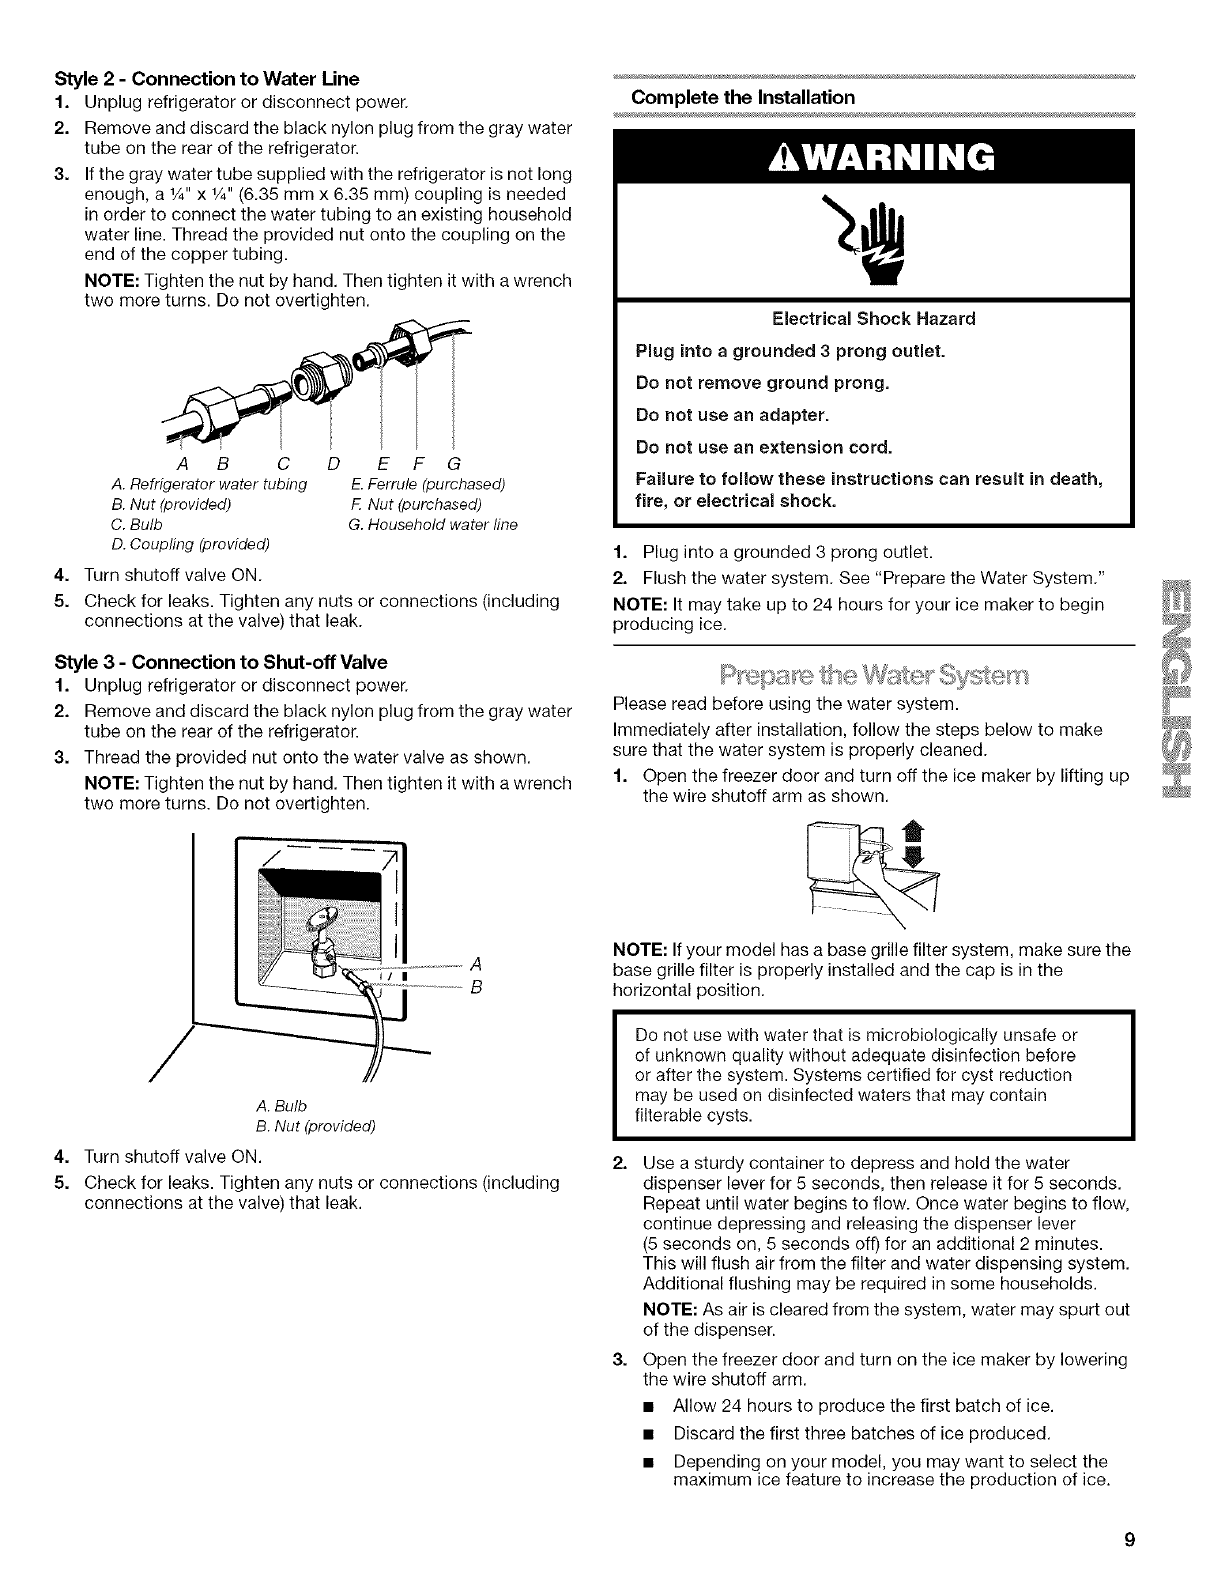 detoximix DTX Meal White caja almuerzo calefactora blanco 1/L 40/W